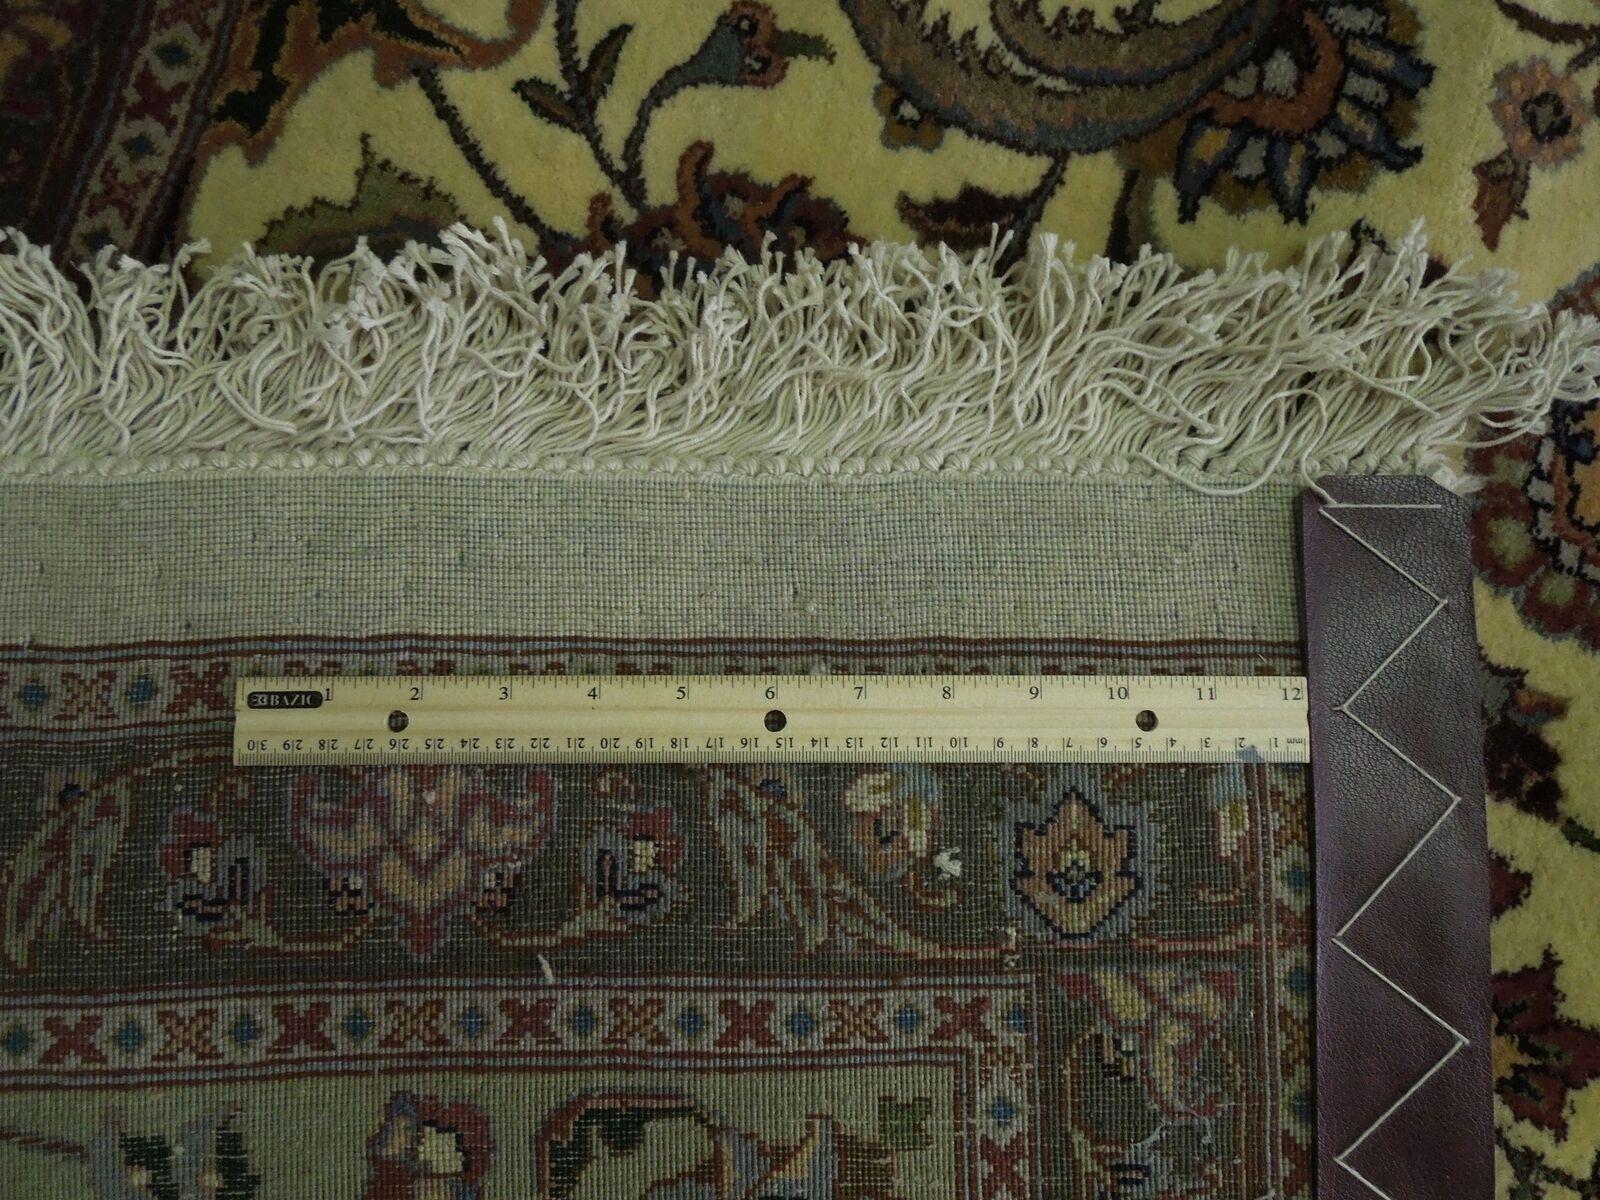 Ivory Rug 12 x 13 Perfect Quality New 12 feet Square Traditional Handmade Rug image 8